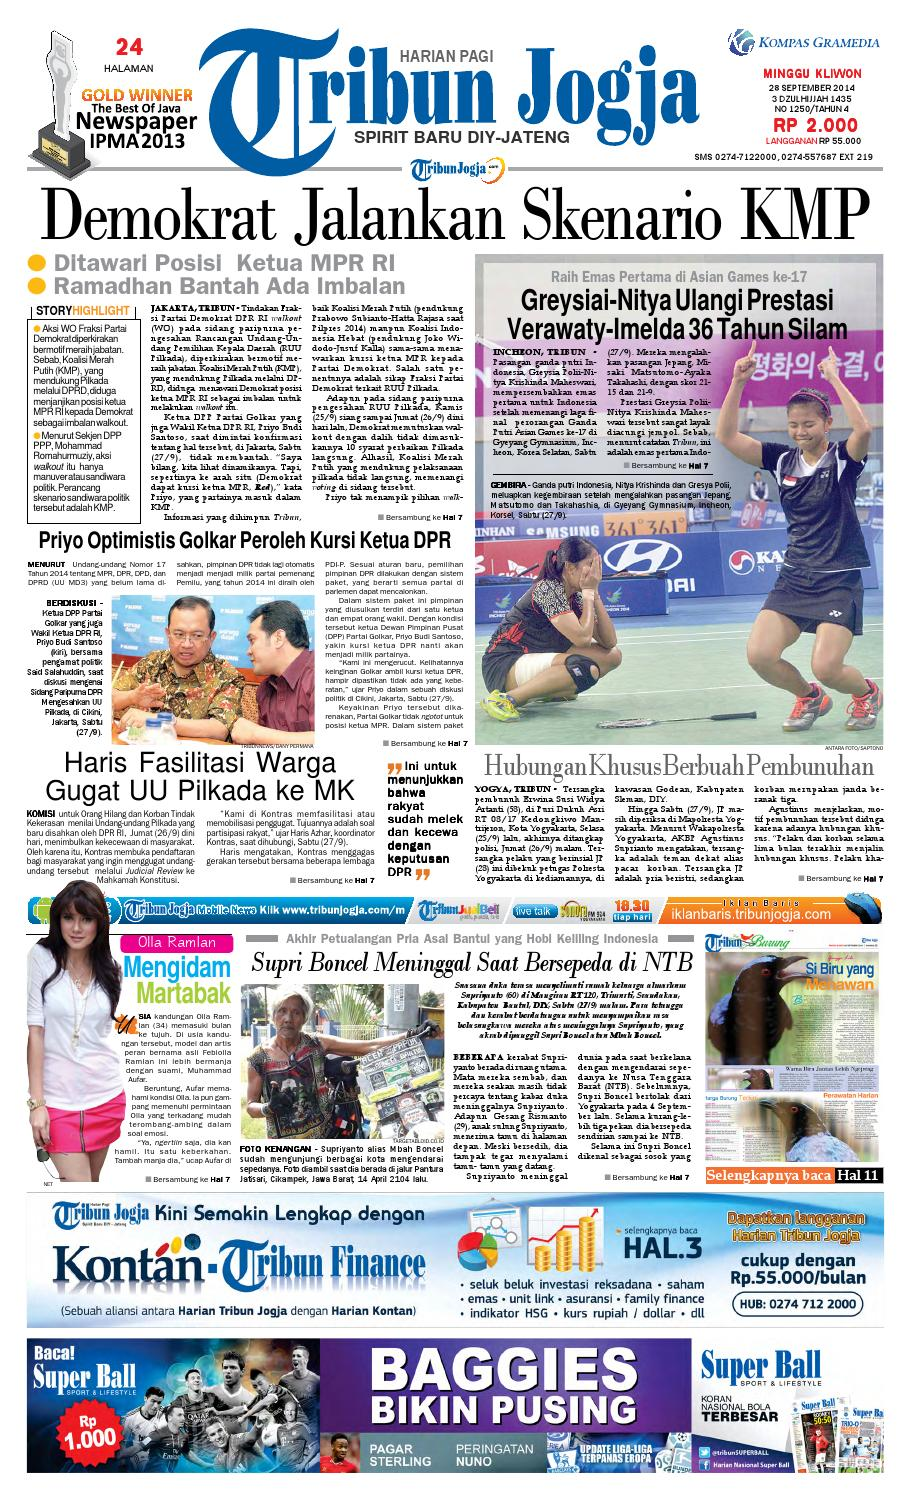 Tribunjogja 28 09 2014 By Tribun Jogja Issuu Produk Ukm Bumn Bale Sehat Teh Rosella Merah 3 Box